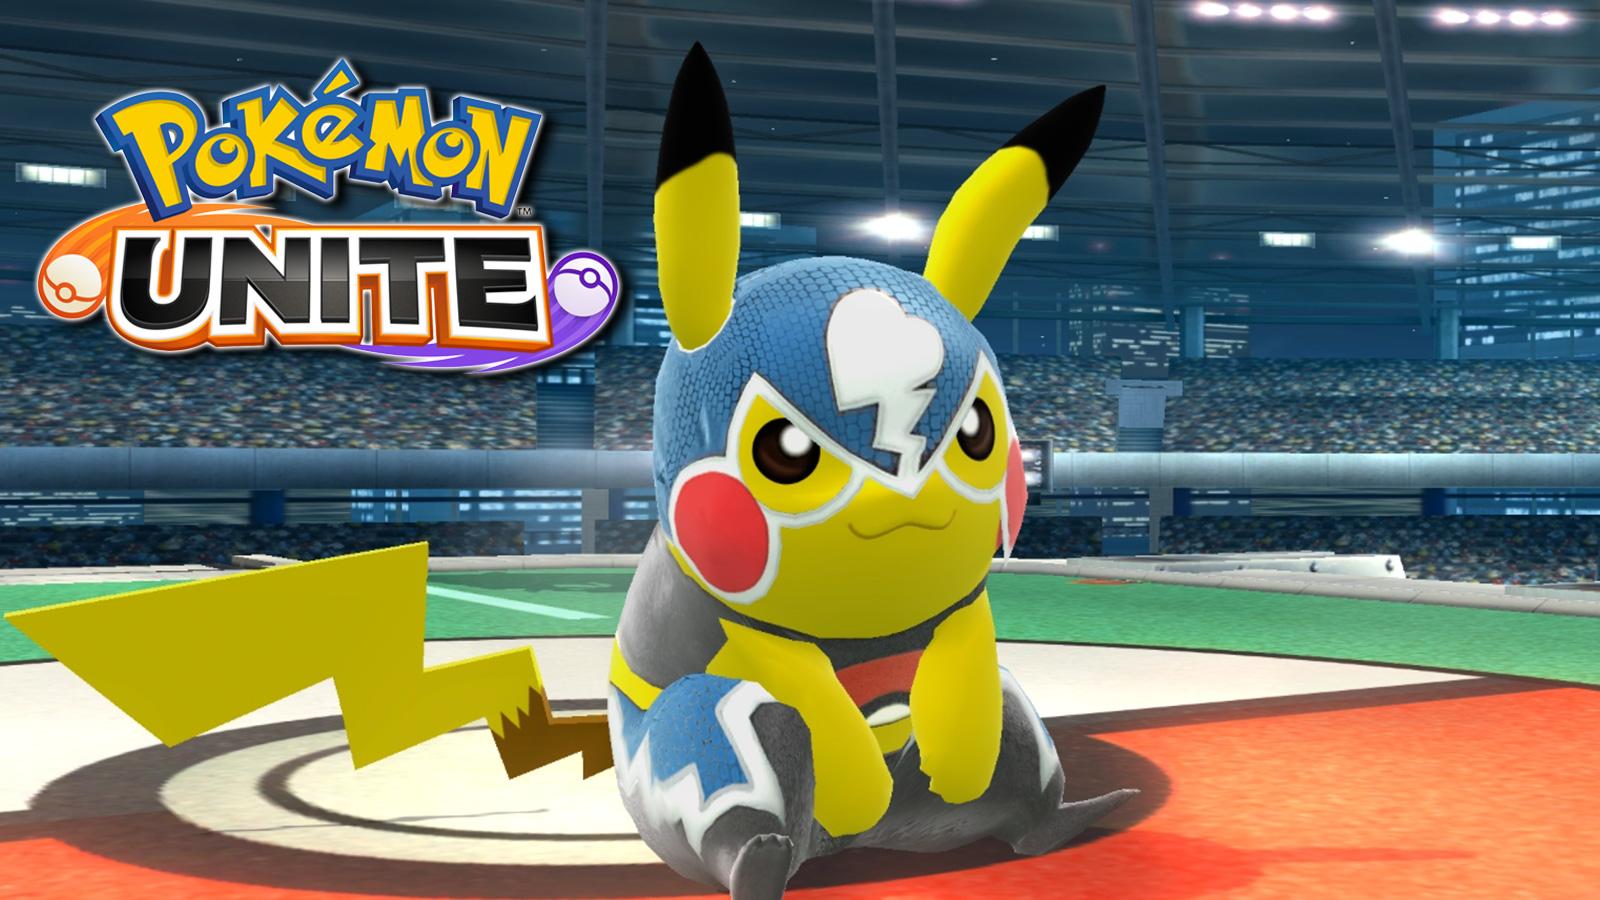 Screenshot of Pikachu Libre from Pokken Tournament next to Unite logo.